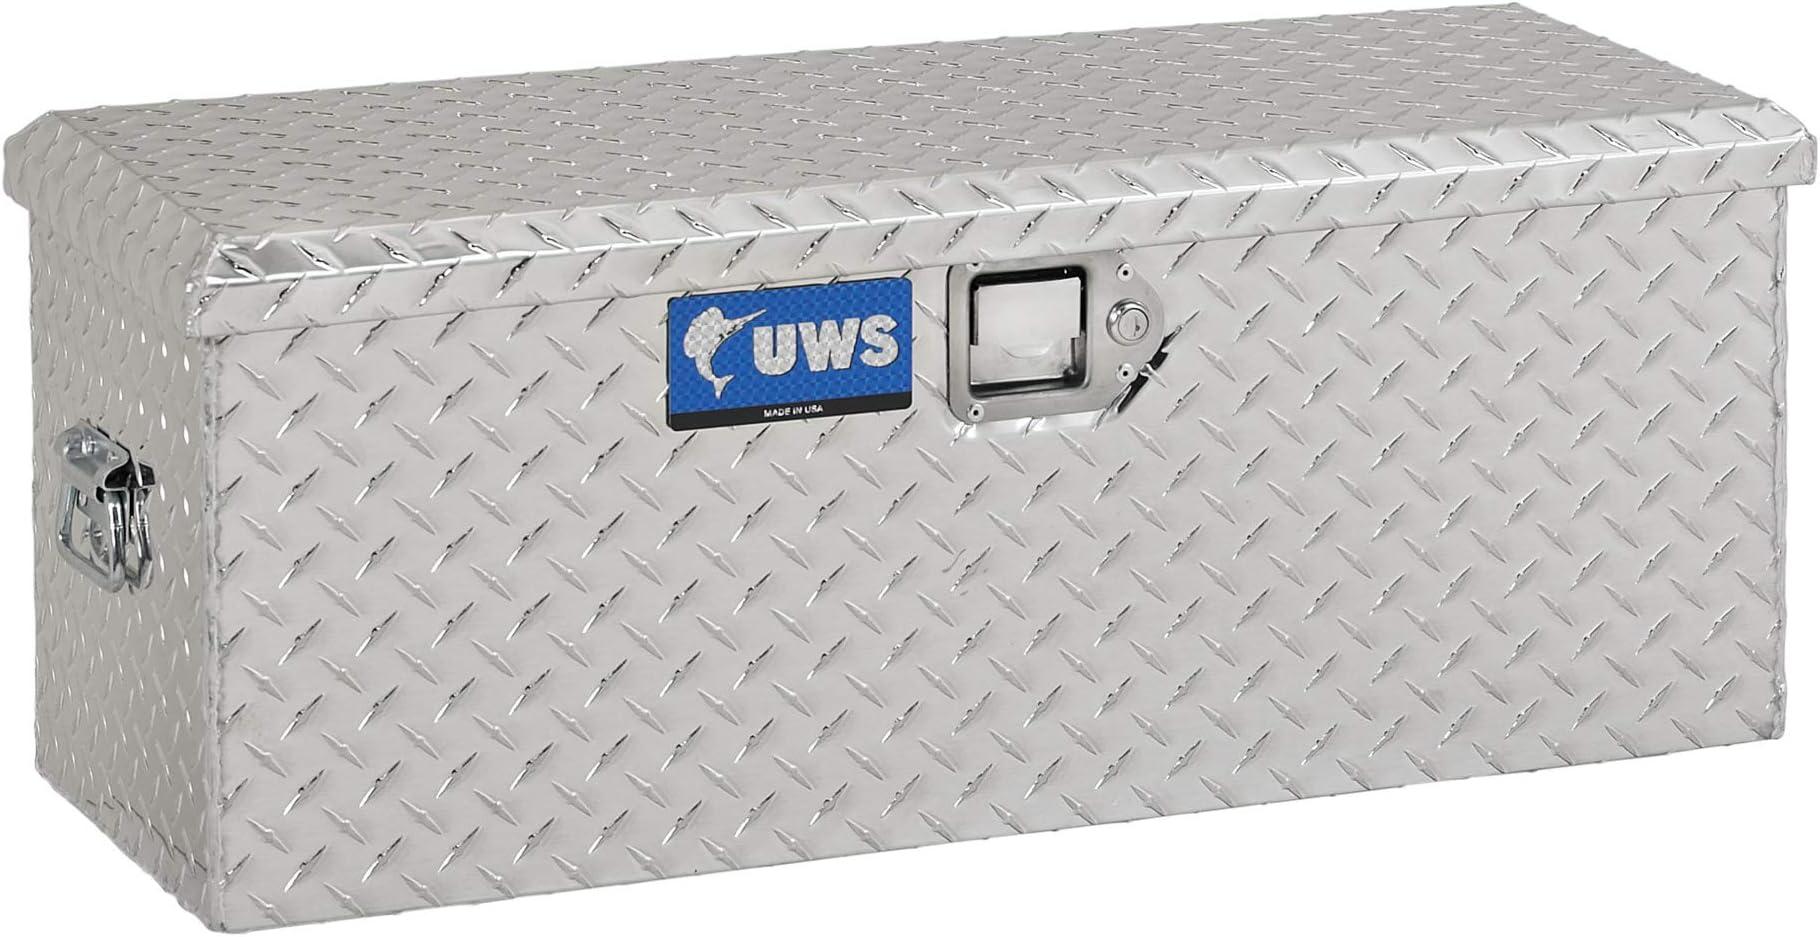 UWS EC20001 32-Inch Heavy-Wall Aluminum ATV Storage Box, RigidCore Lid , Black